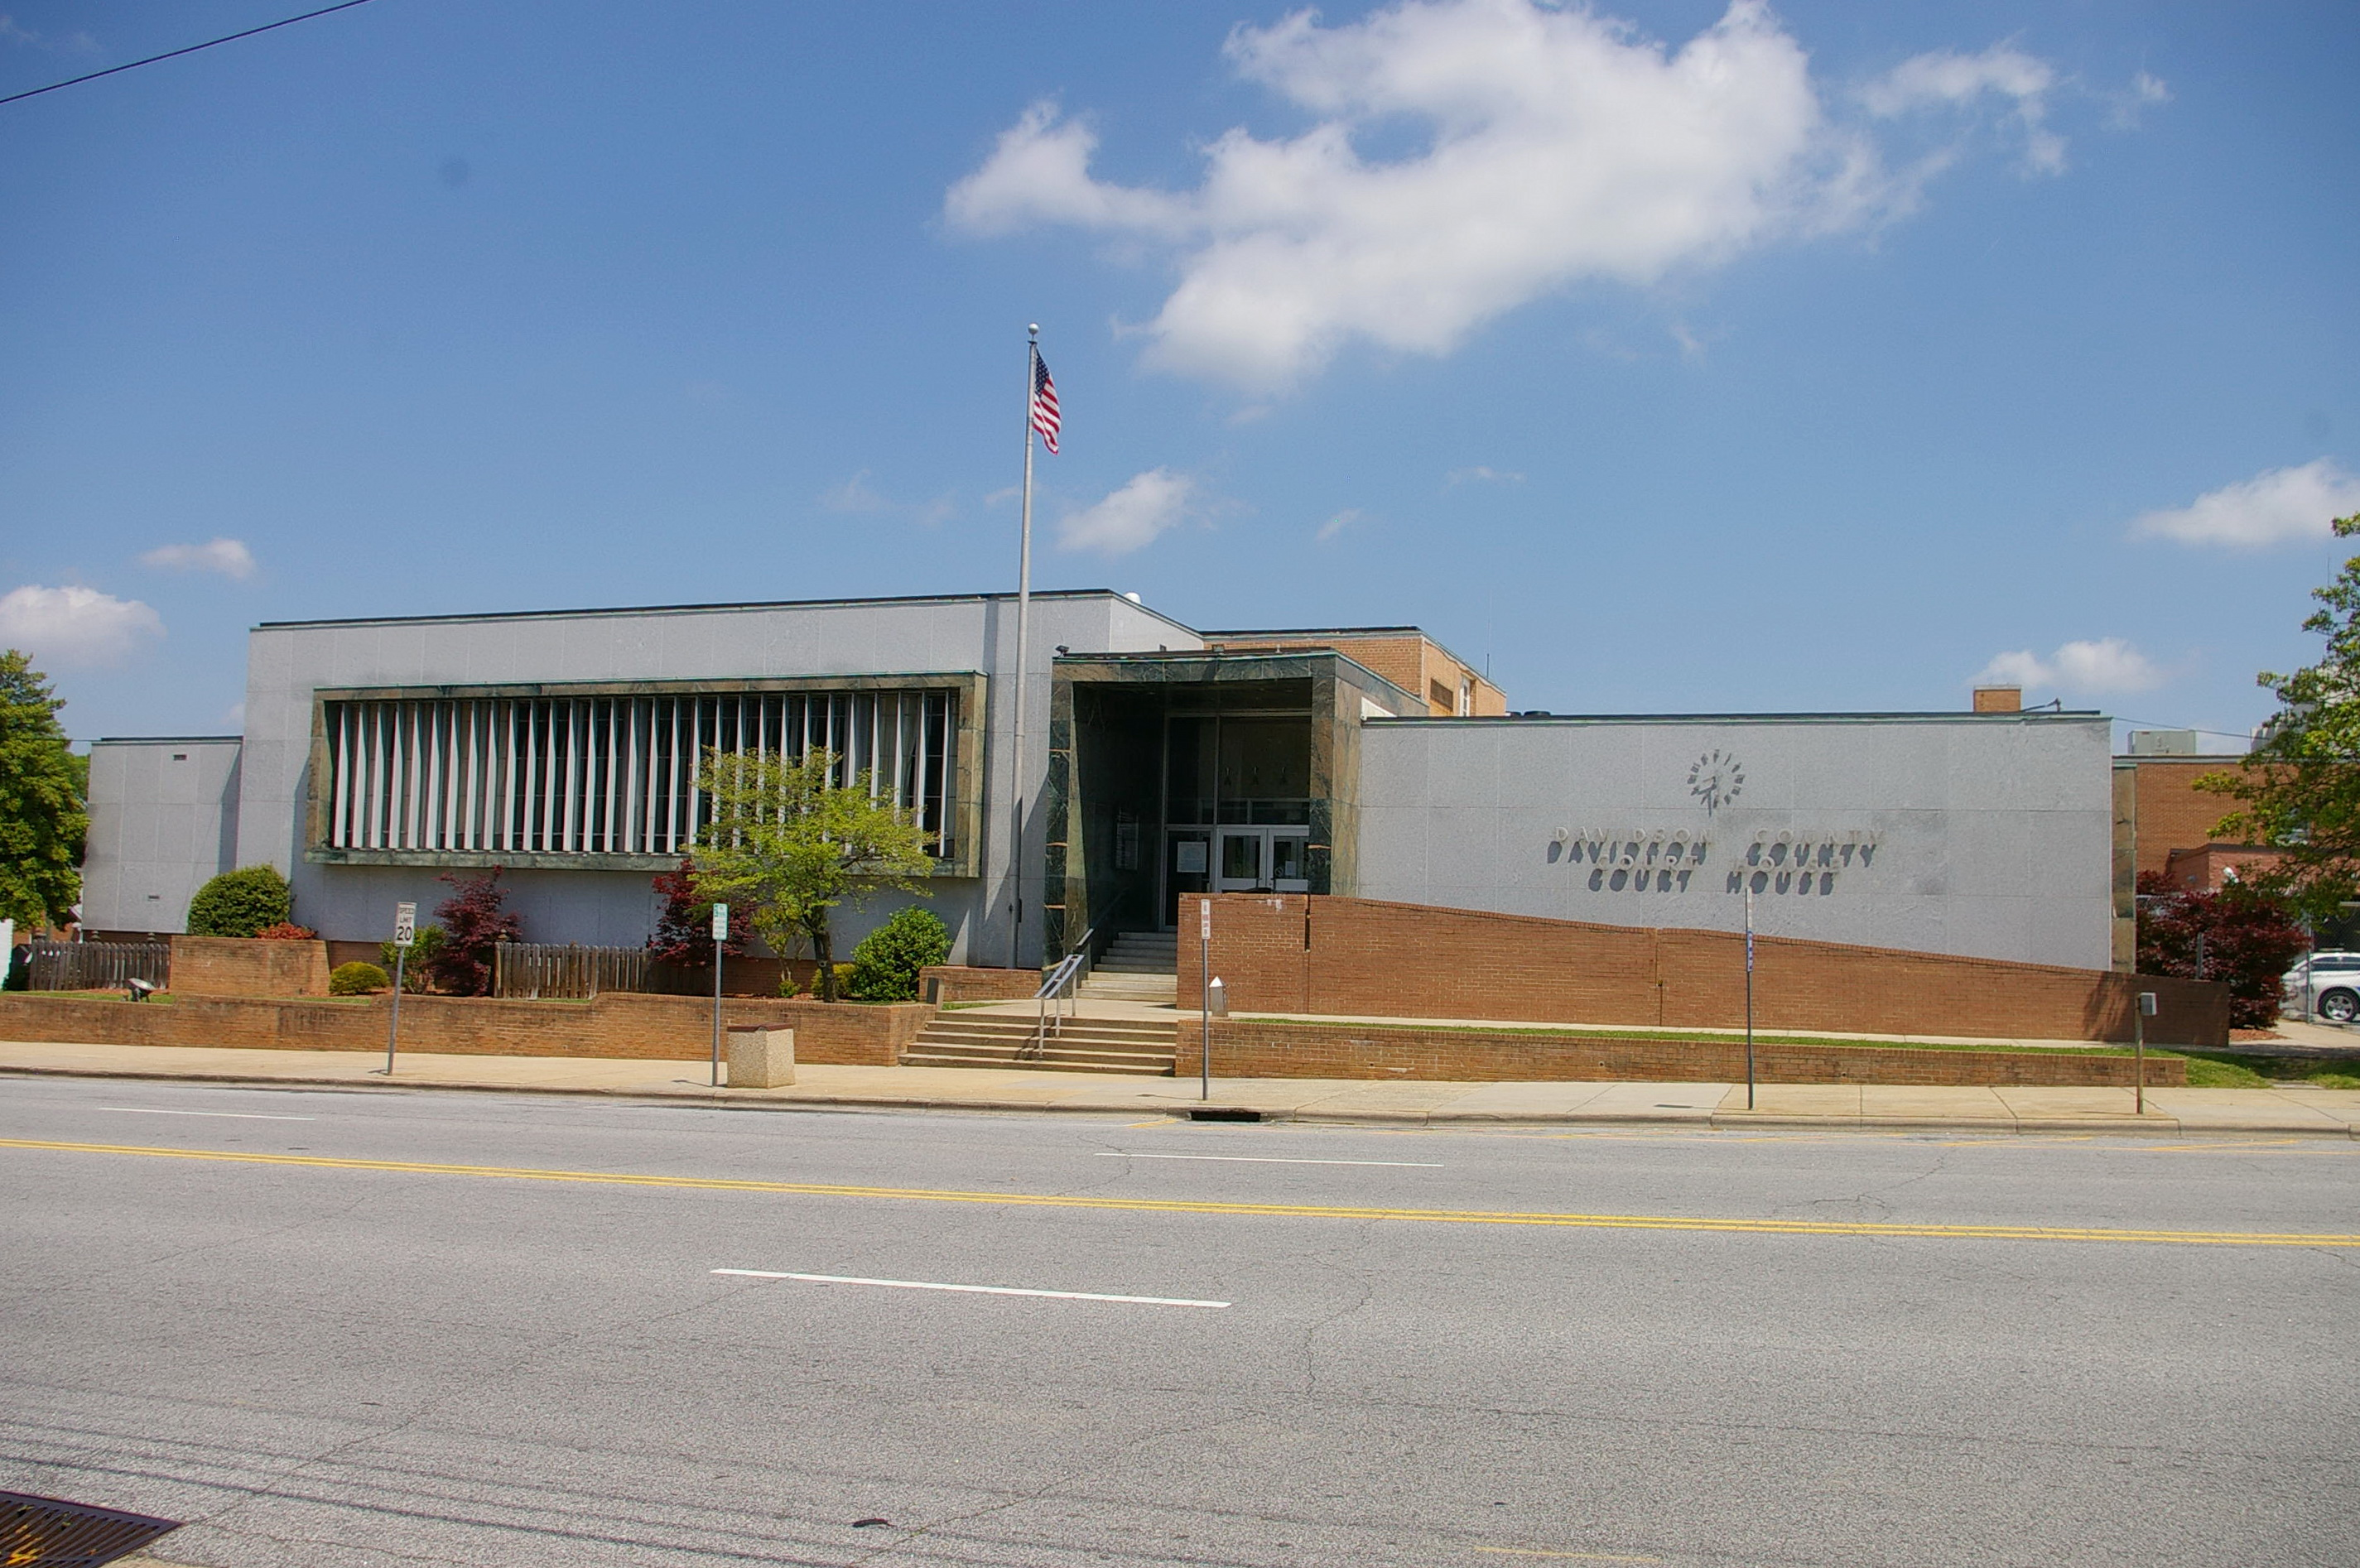 Davidson County | US Courthouses